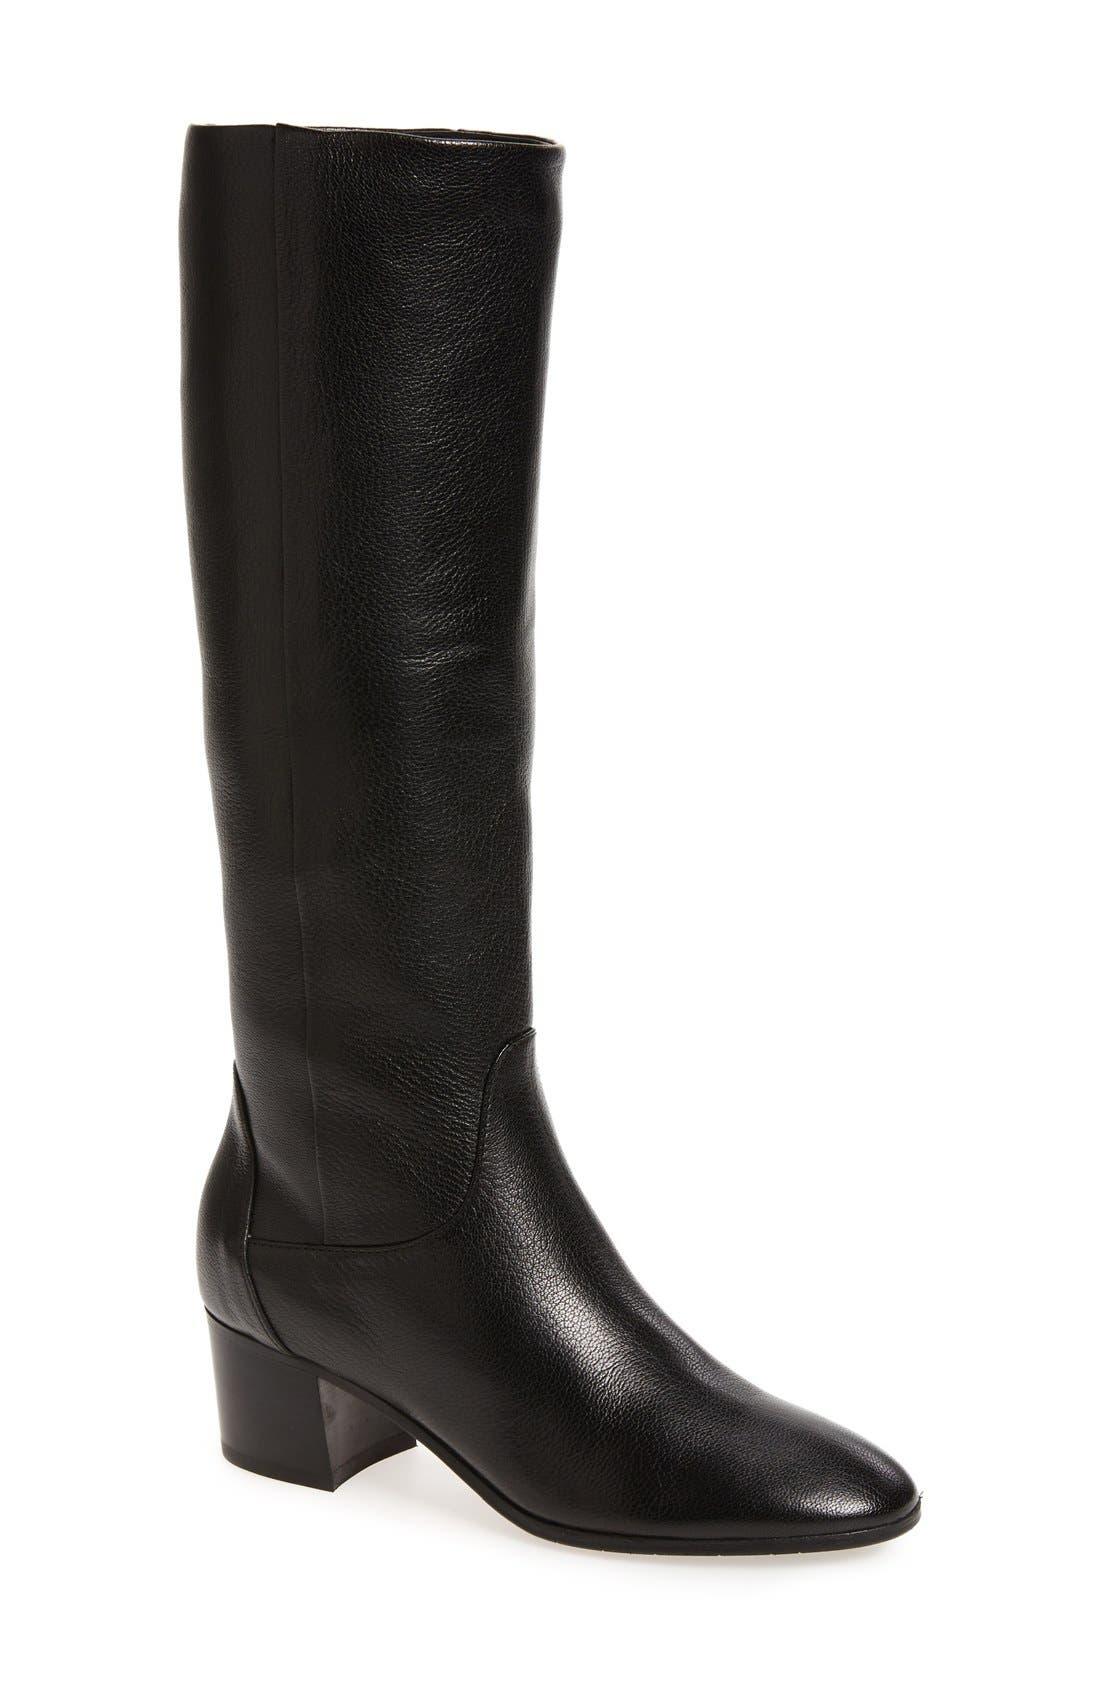 AQUATALIA,                             Deanna Weatherproof Knee High Boot,                             Main thumbnail 1, color,                             001